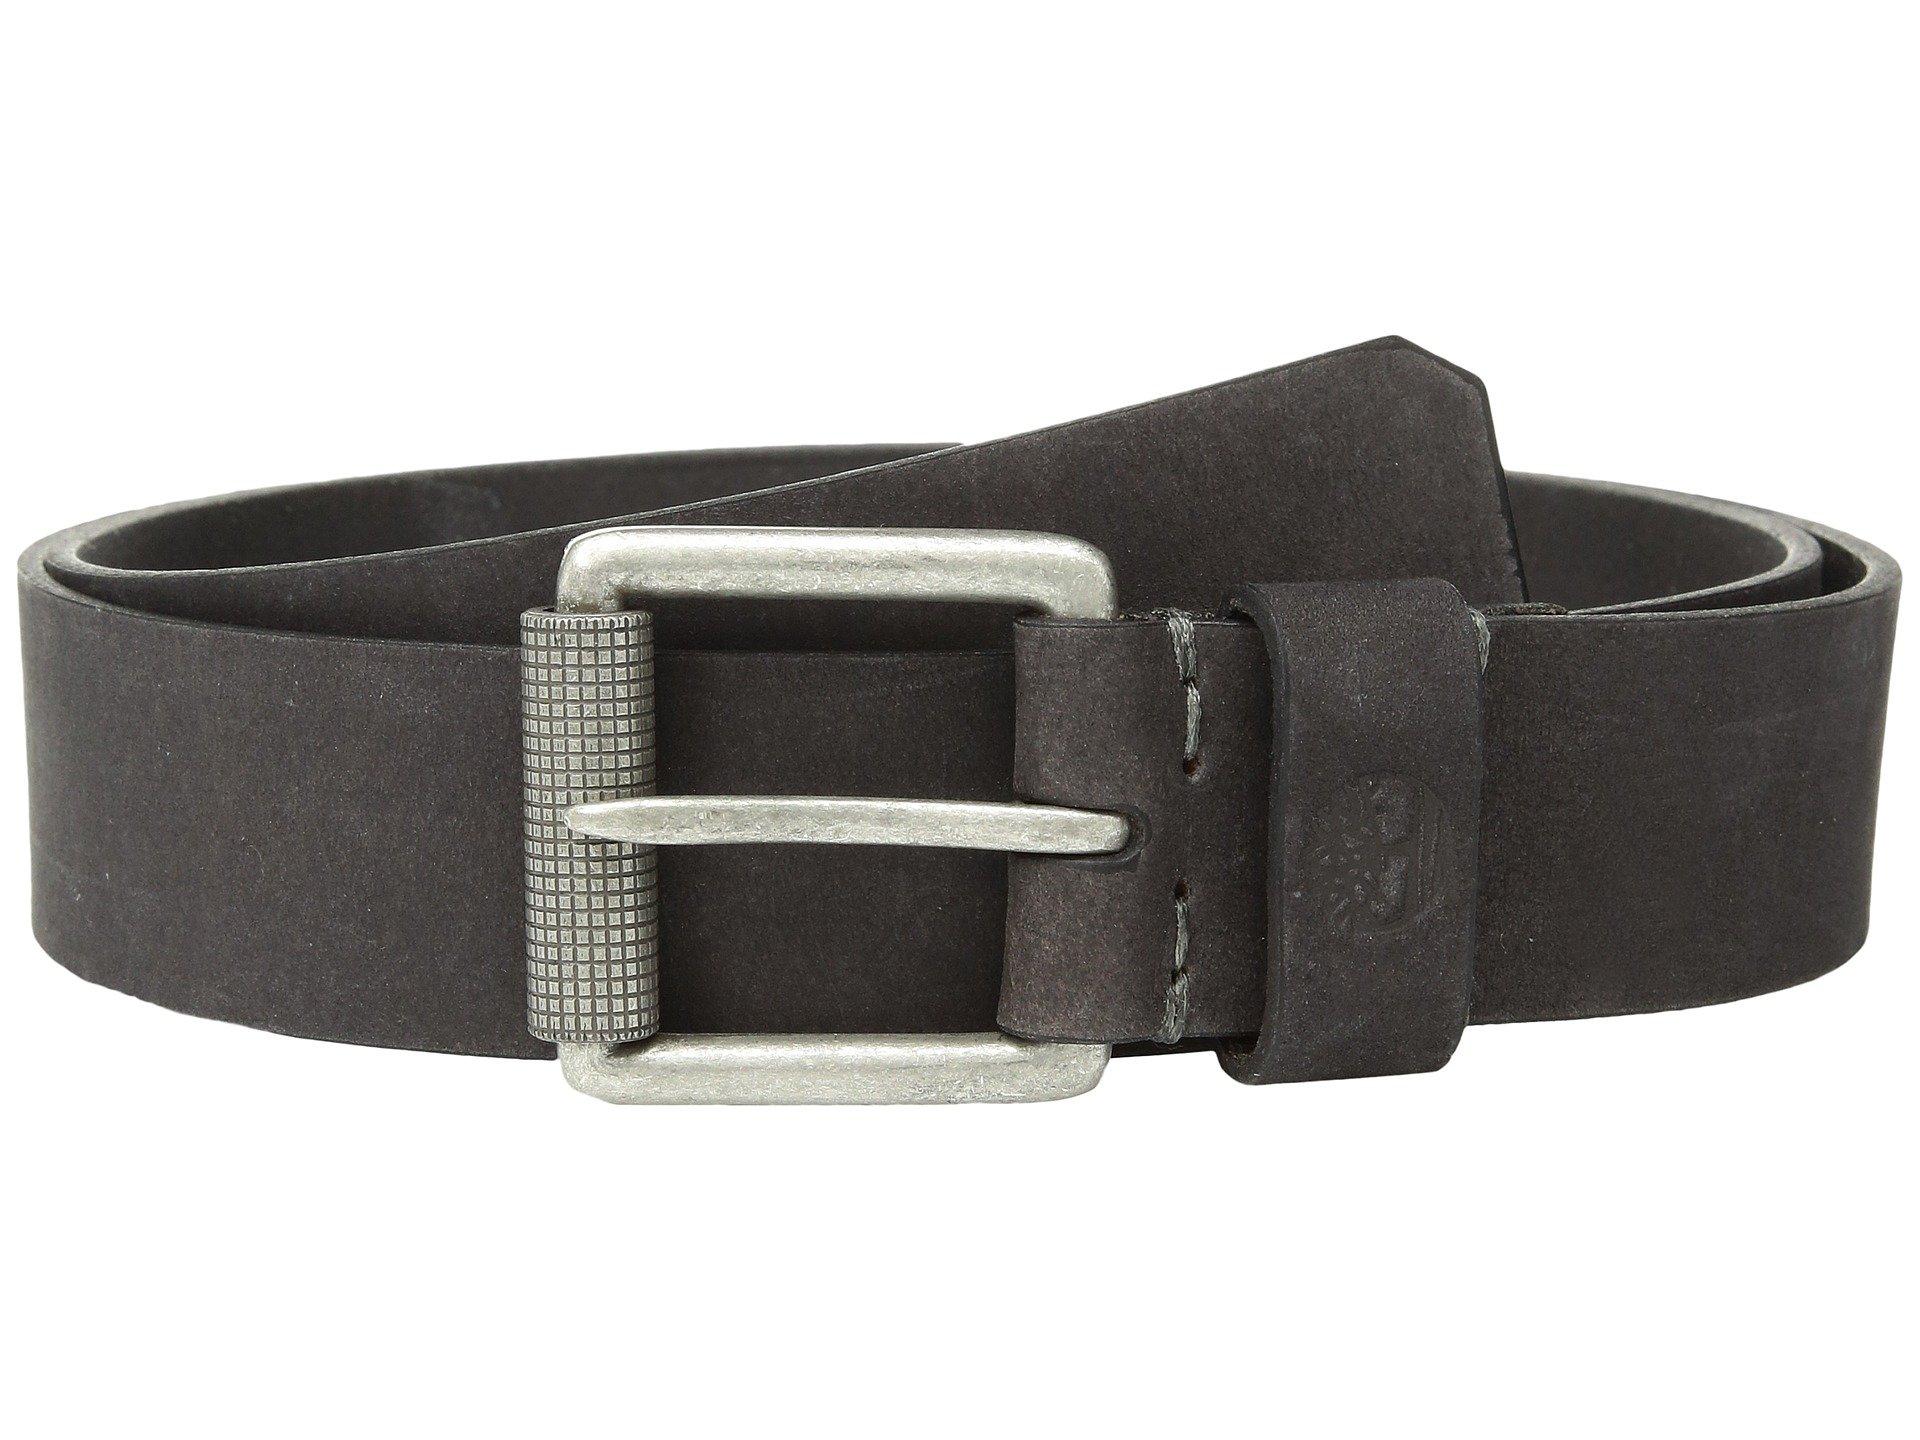 Correa o Cinturon para Hombre Timberland 40mm Roller Buckle Belt  + Timberland en VeoyCompro.net